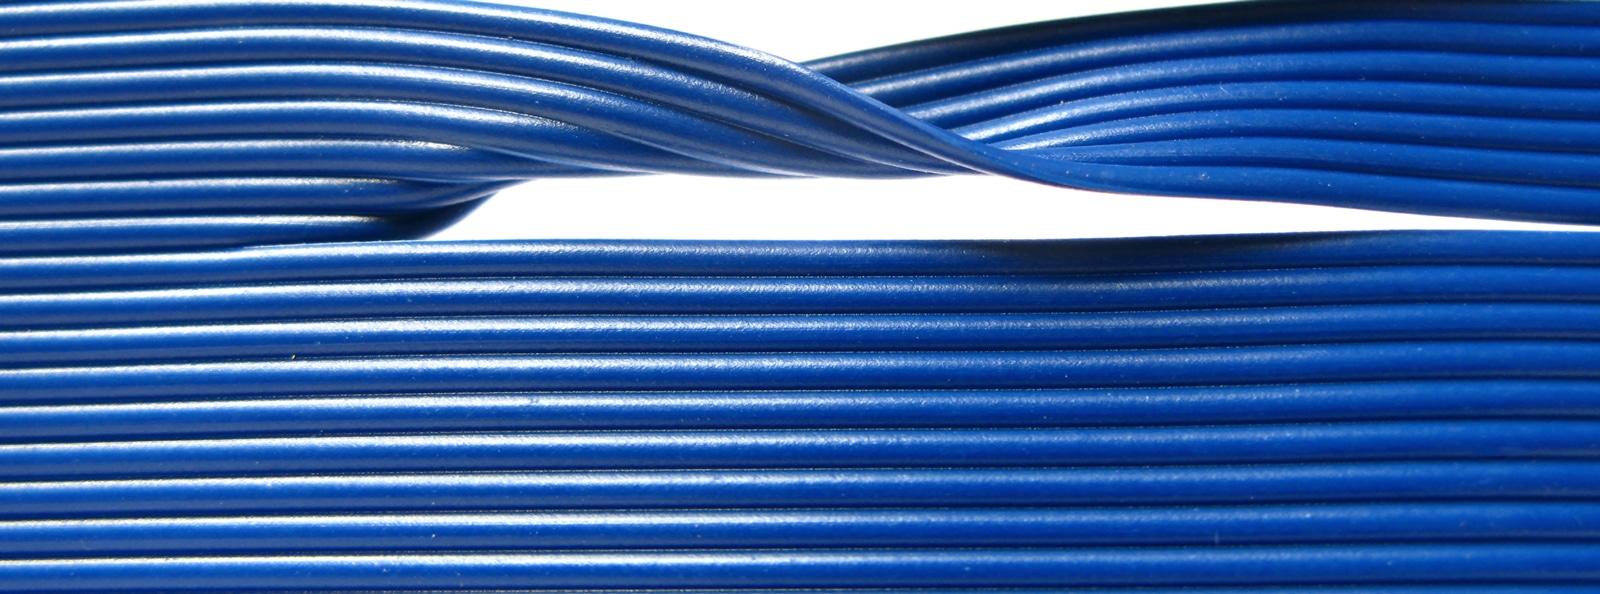 sarrianet-cables-azul